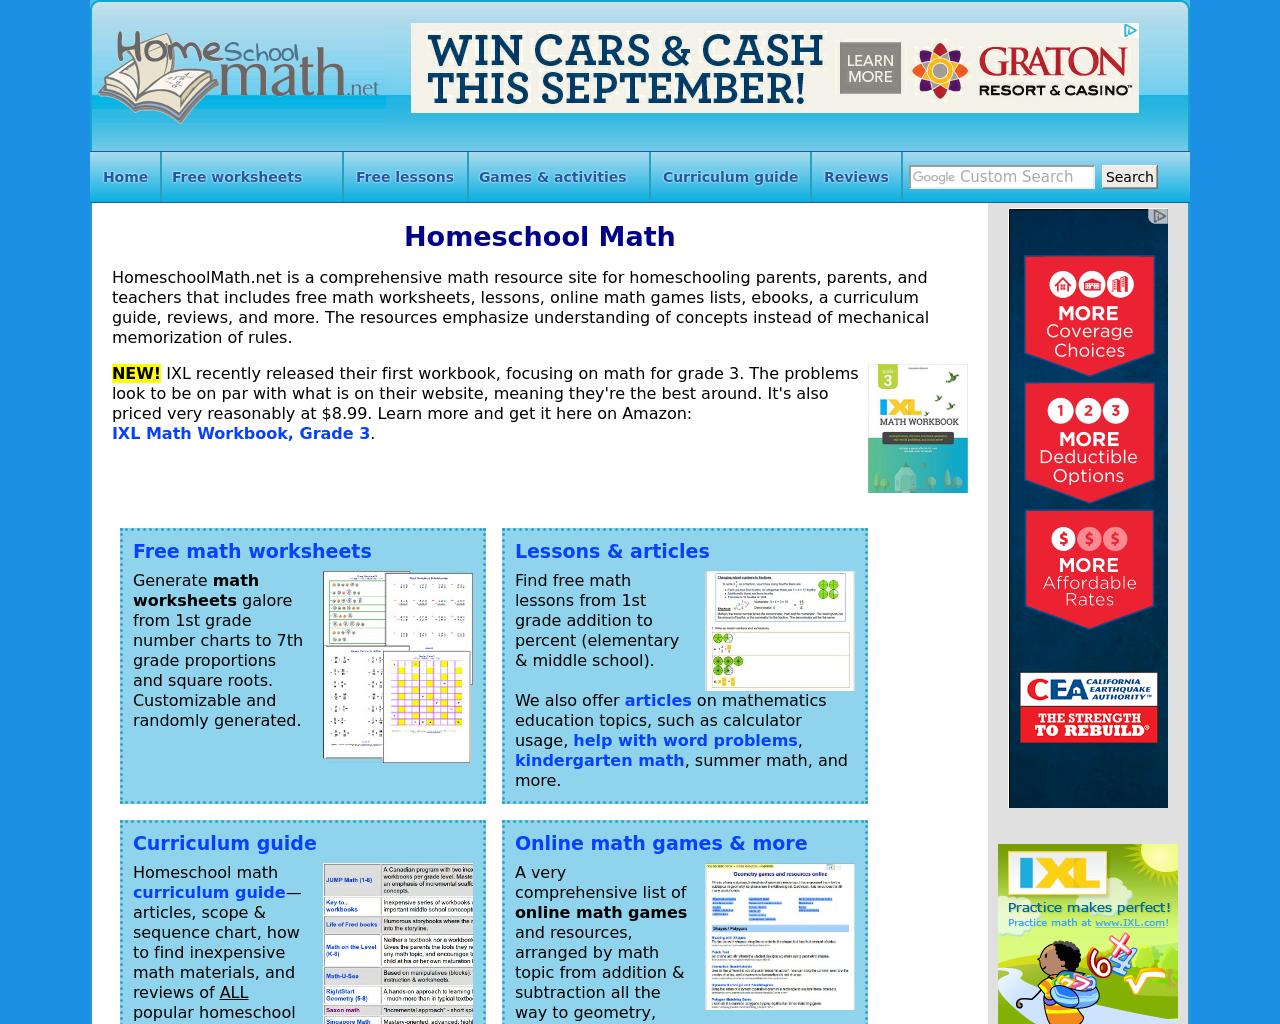 homeschoolmath.net-Advertising-Reviews-Pricing